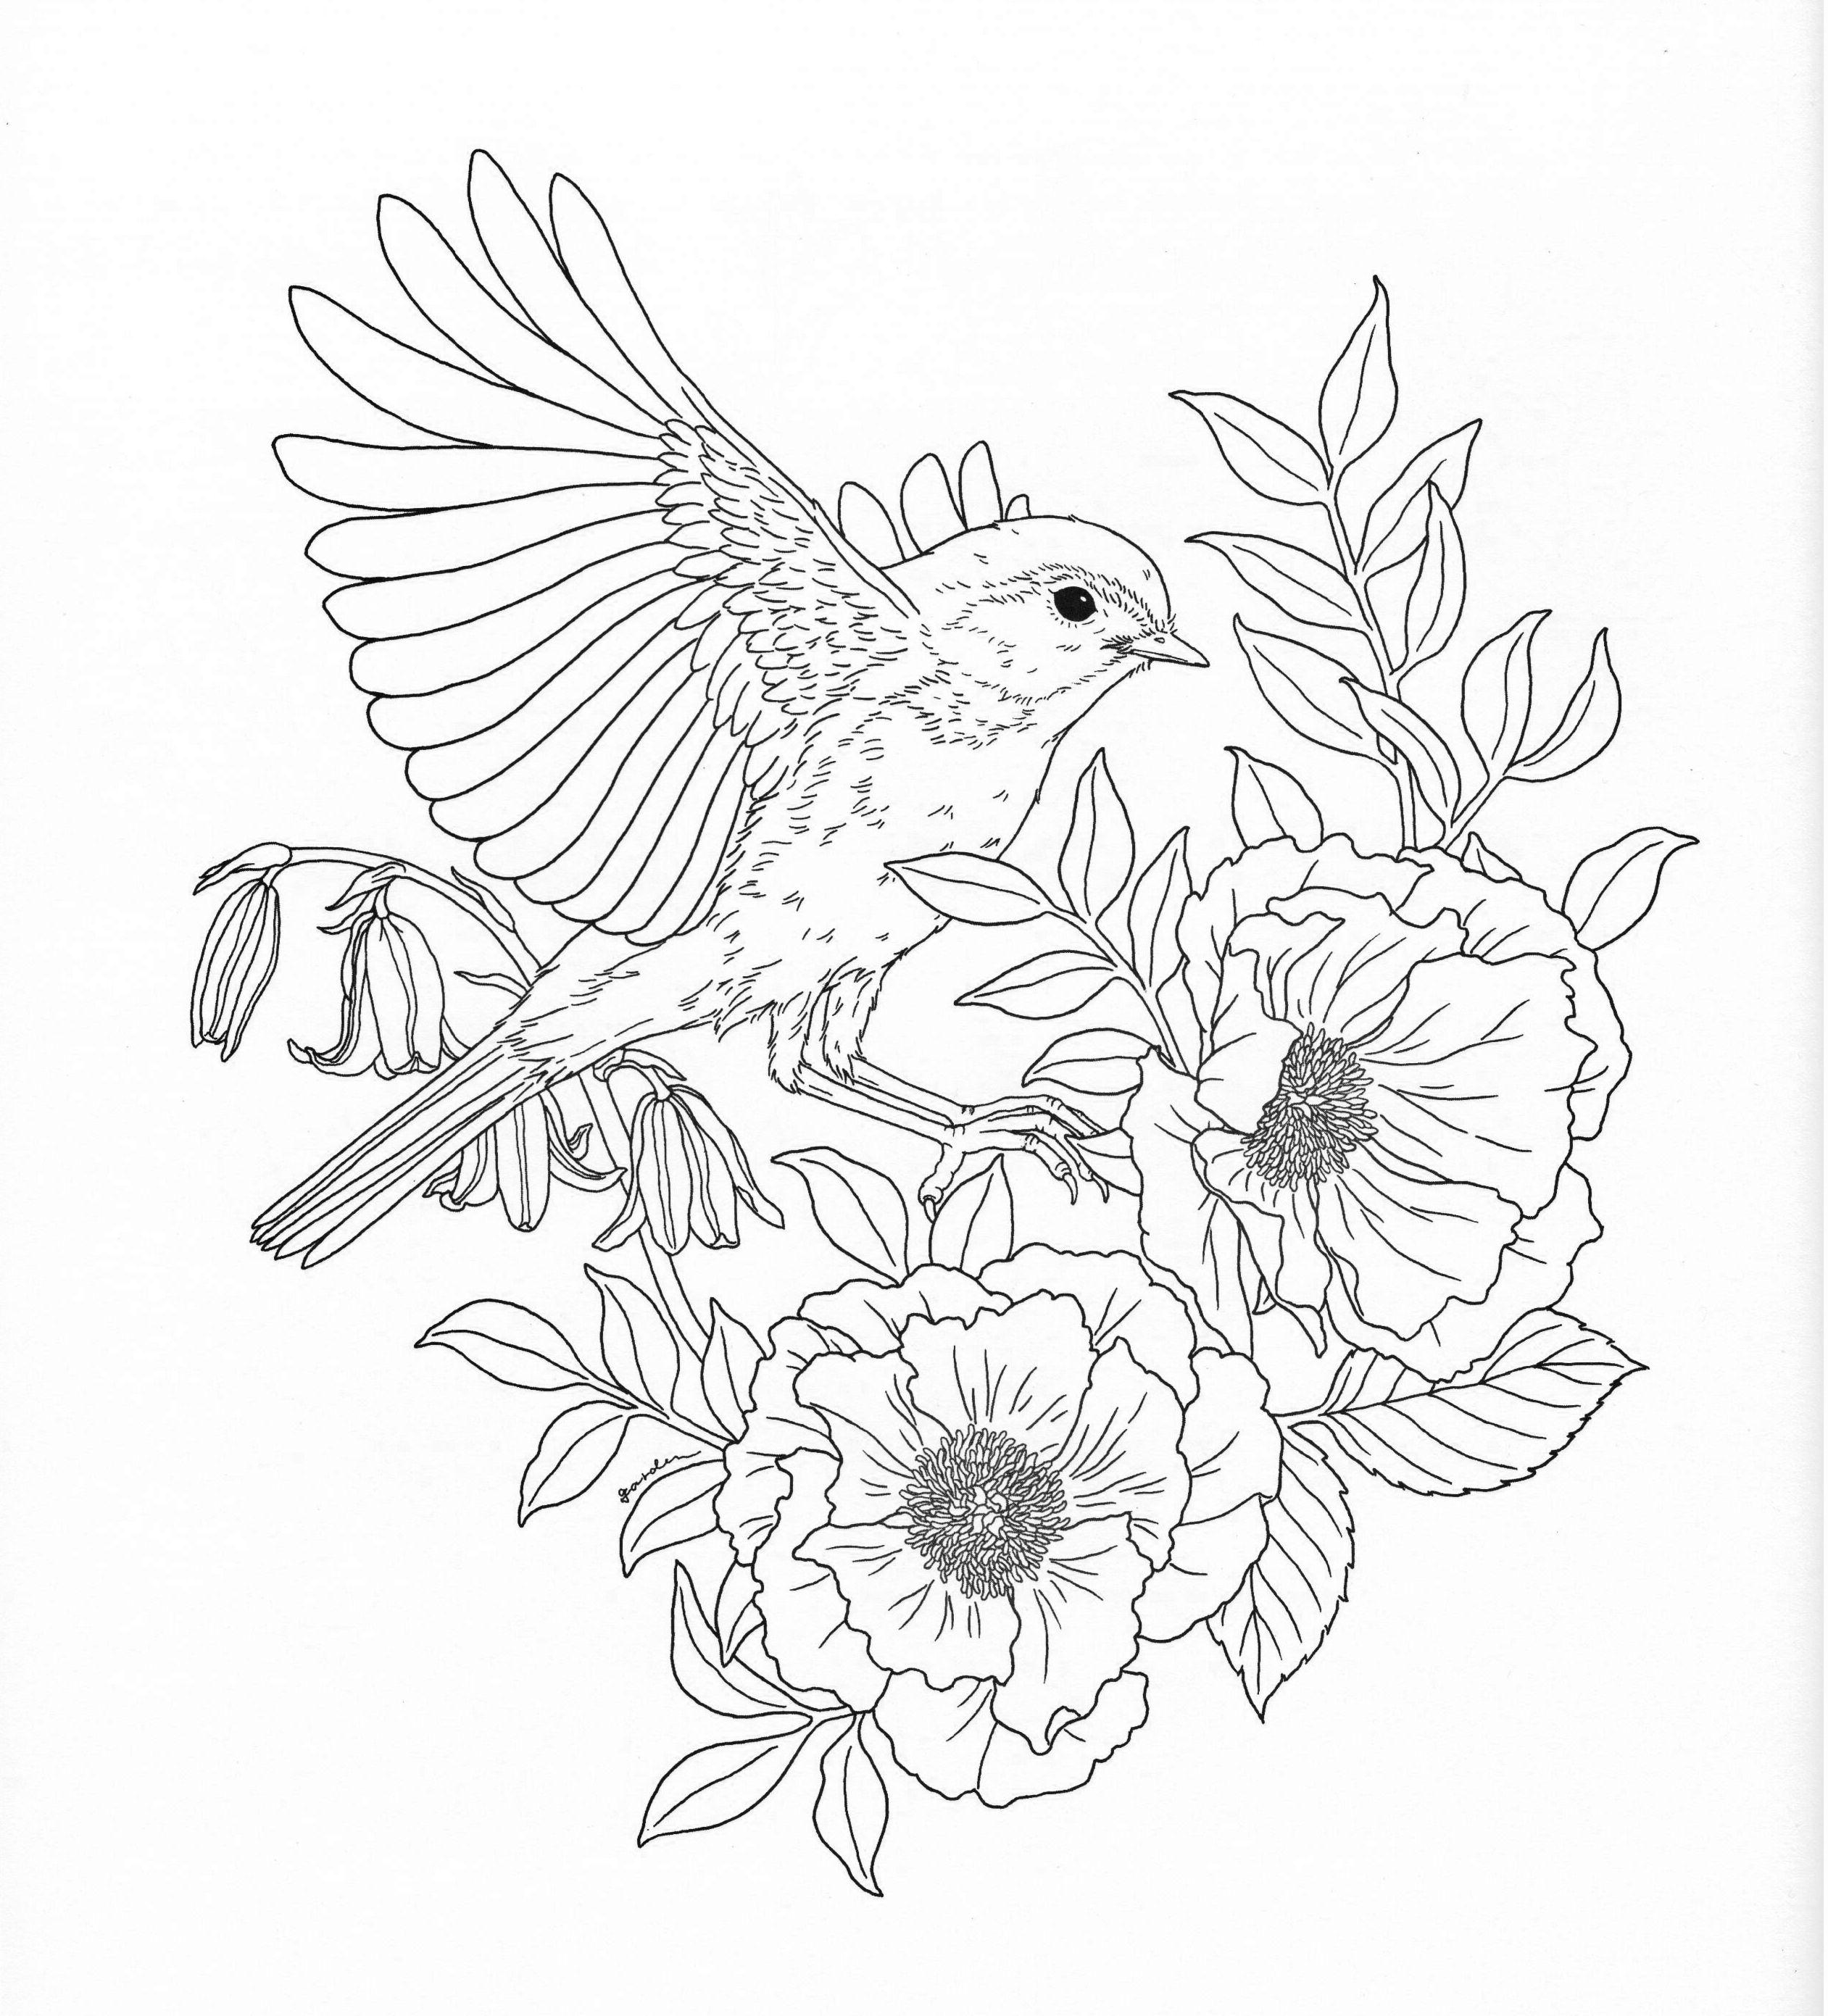 Bird Coloring Page Bird Coloring Pages Coloring Pages Nature Animal Coloring Pages